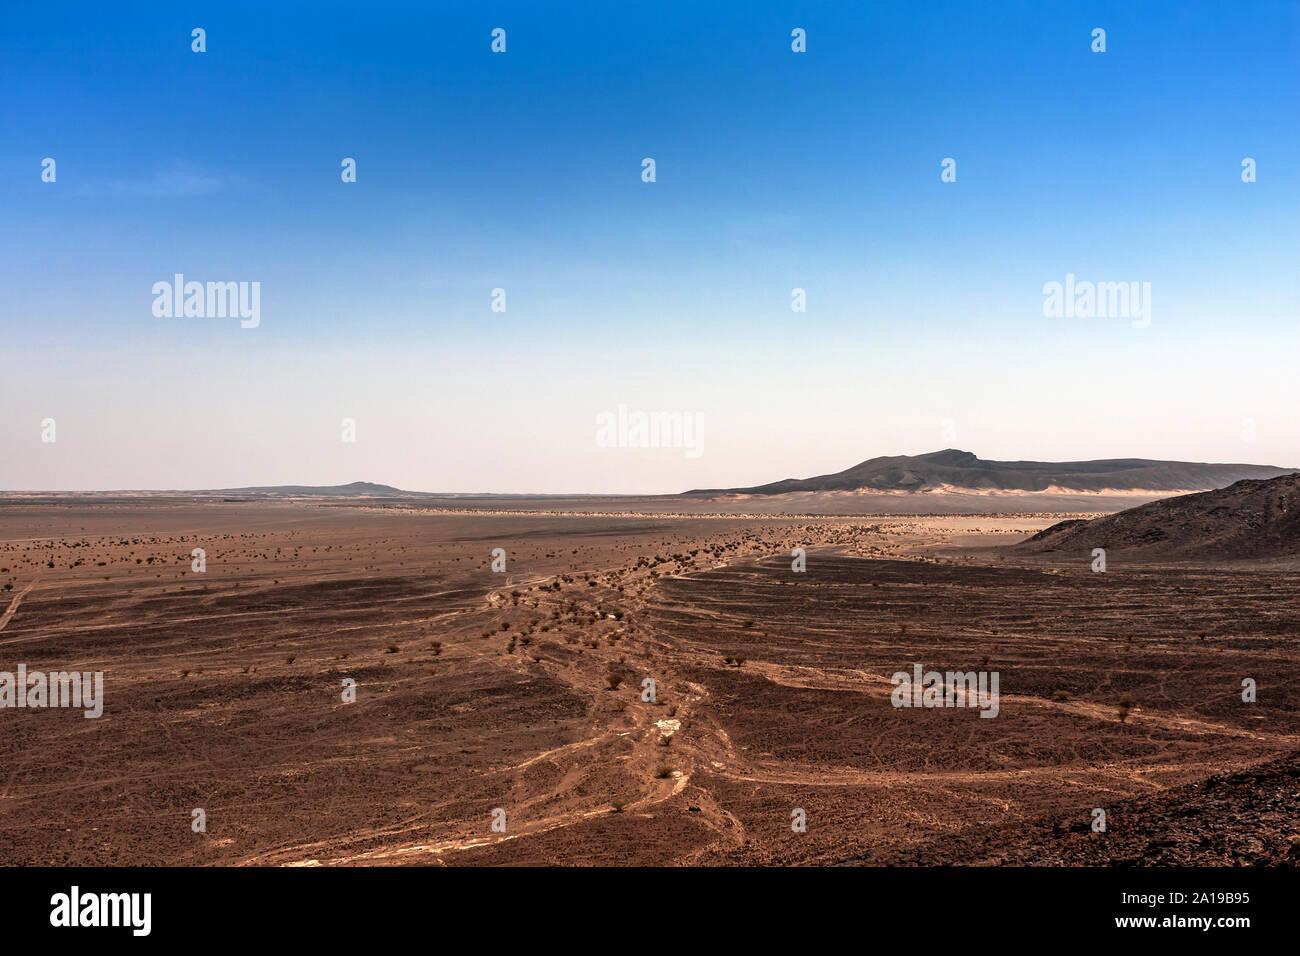 An Aerial View Of The Harrat Kishb Volcanic Field Makkah Province Saudi Arabia Stock Photo Alamy